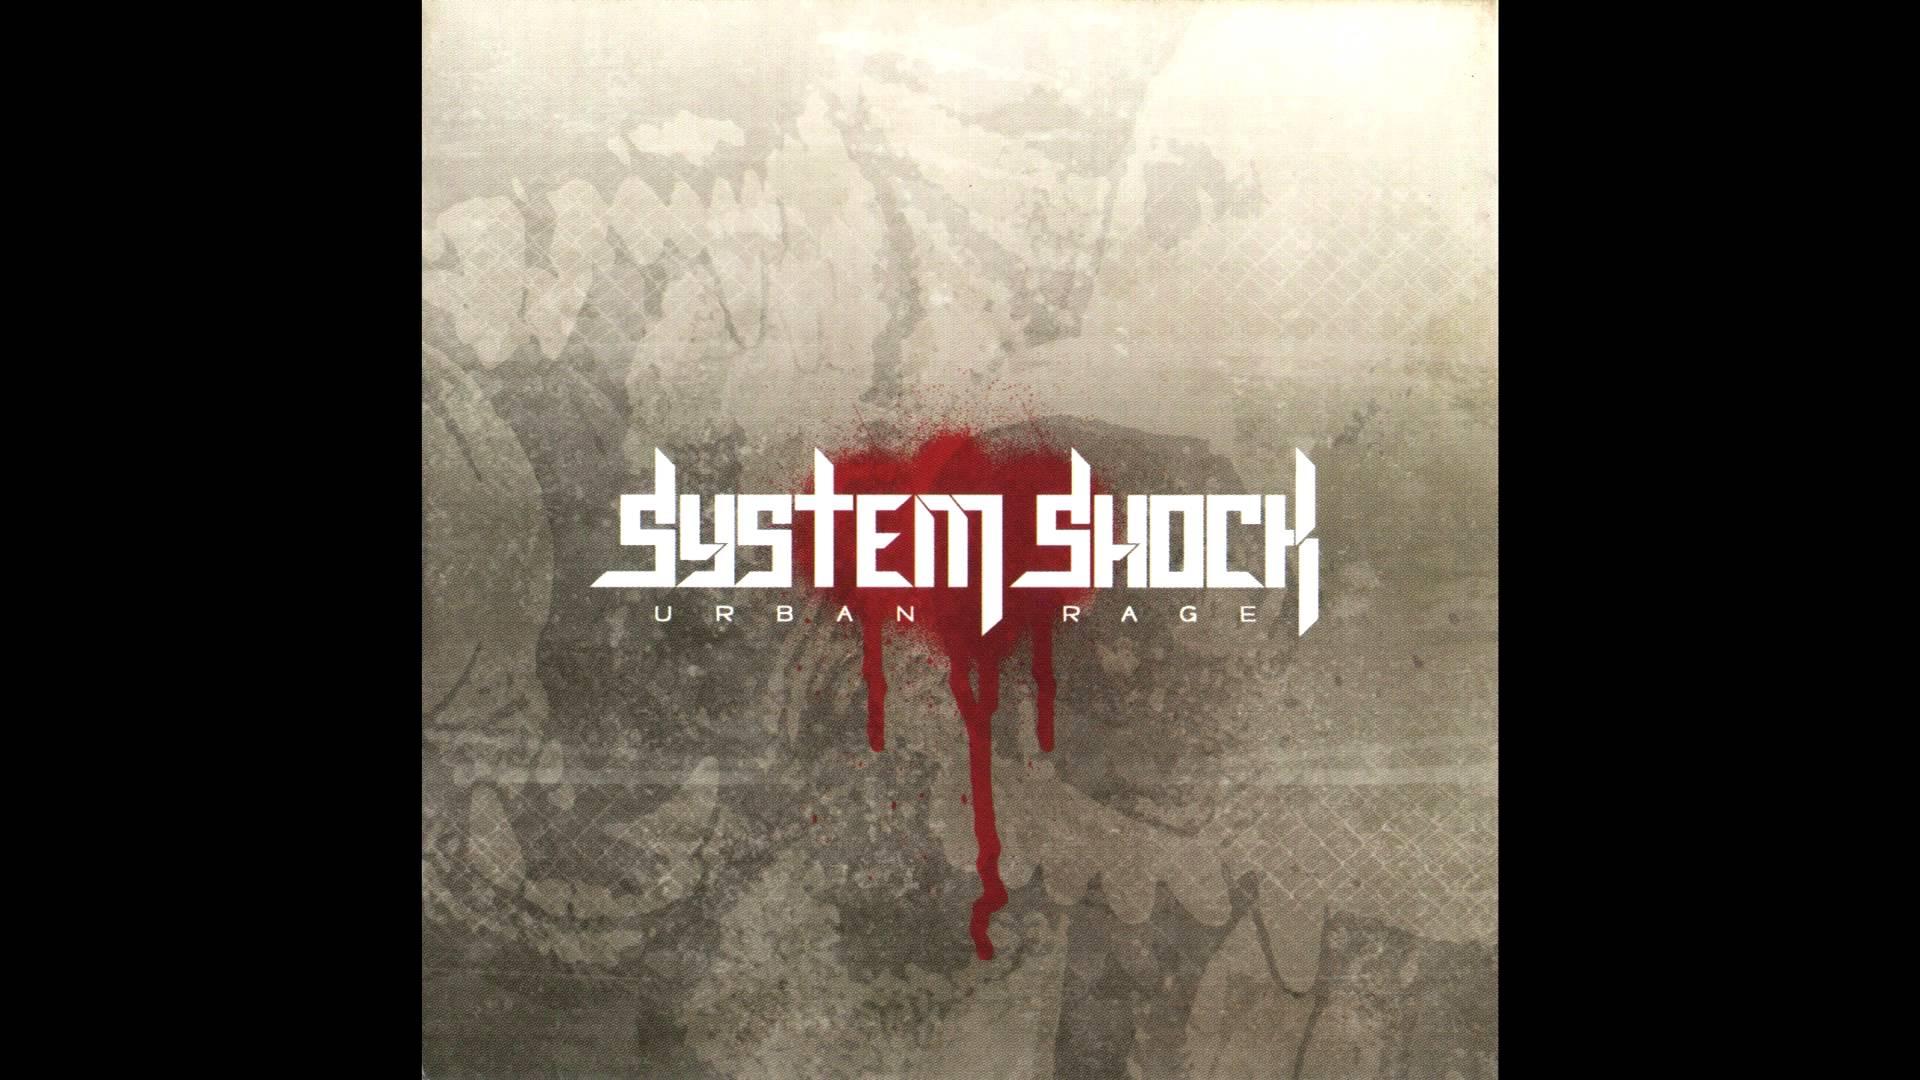 System Shock - Urban Rage (Full album HQ)